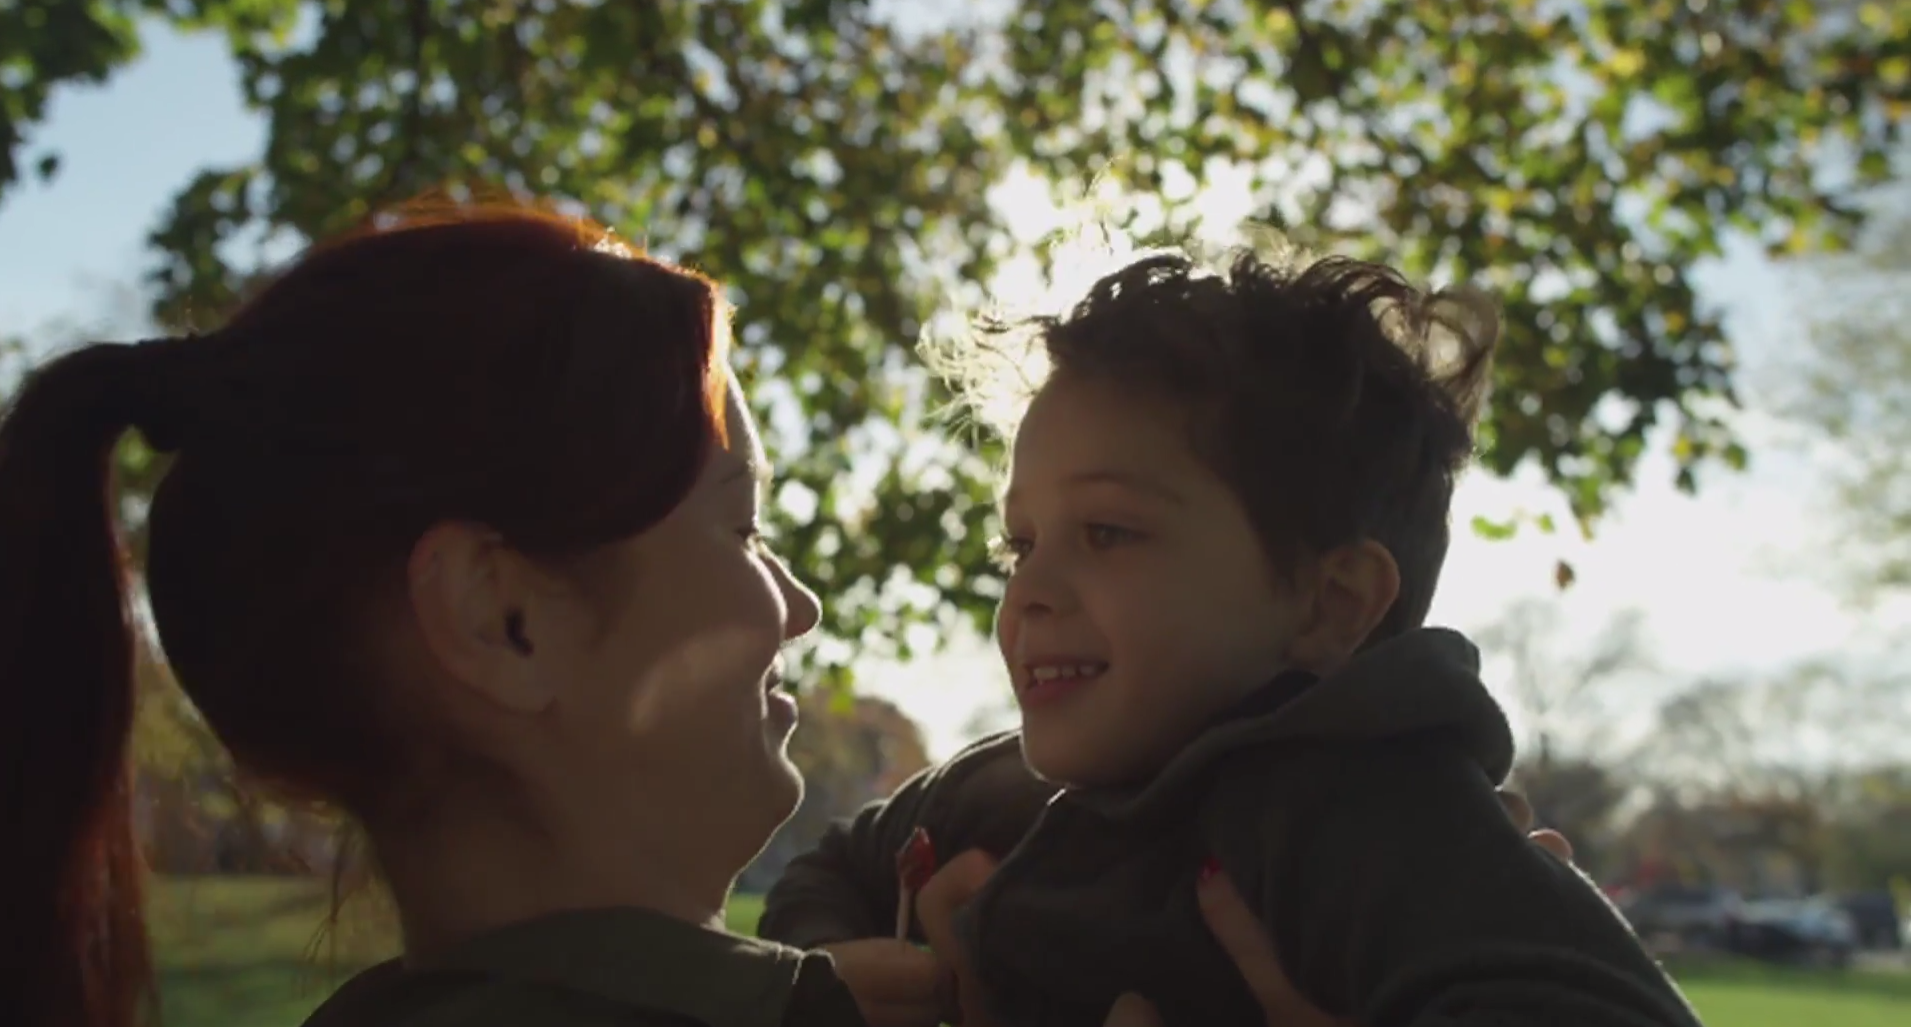 Dit filmpje kan vrouwenlevens veranderen en kinderlevens redden